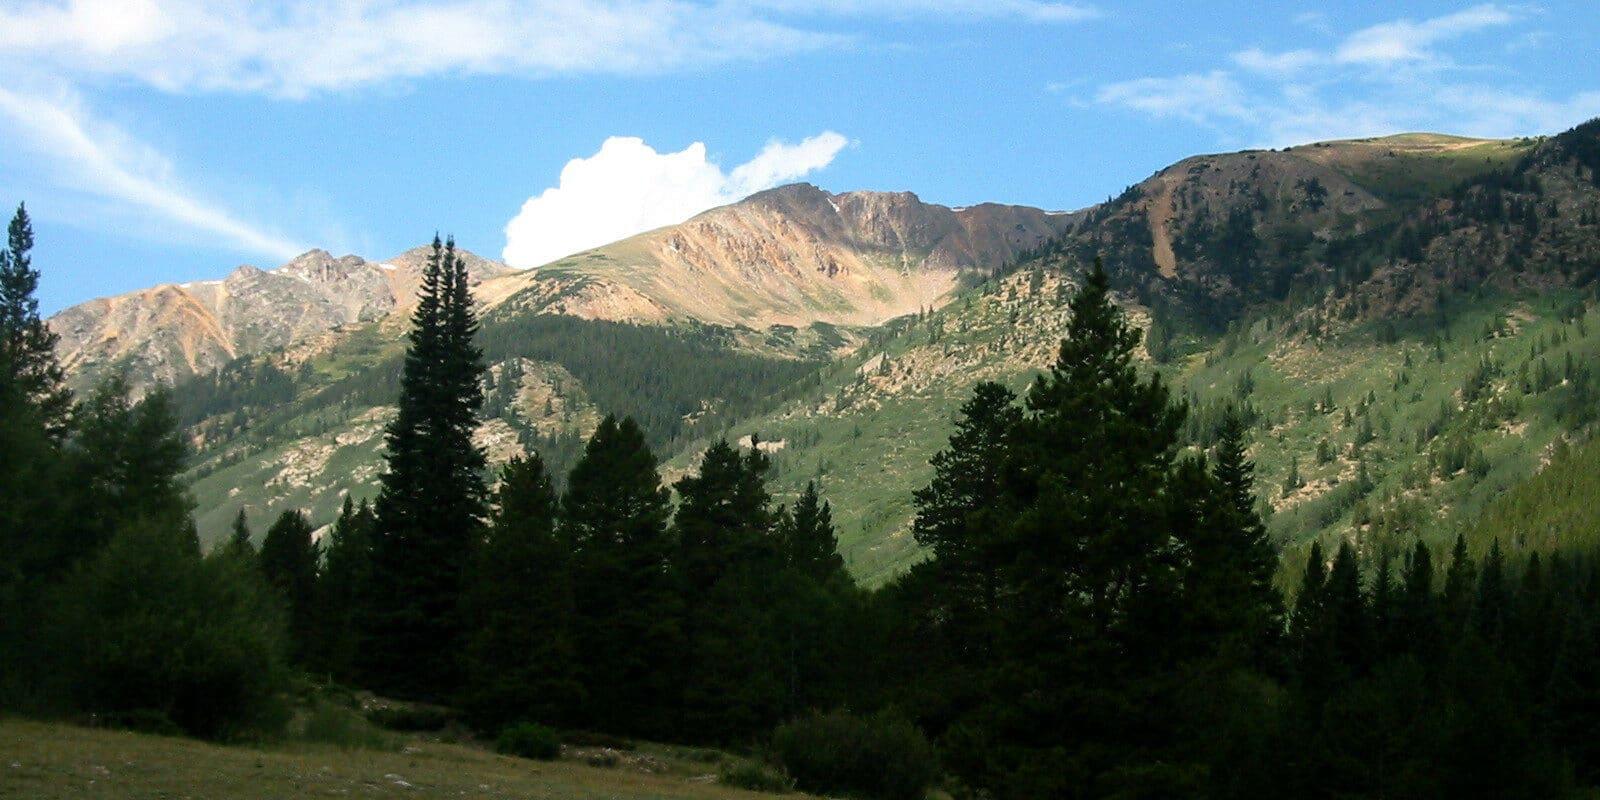 Image of La Plata Peak from Winfield, Colorado